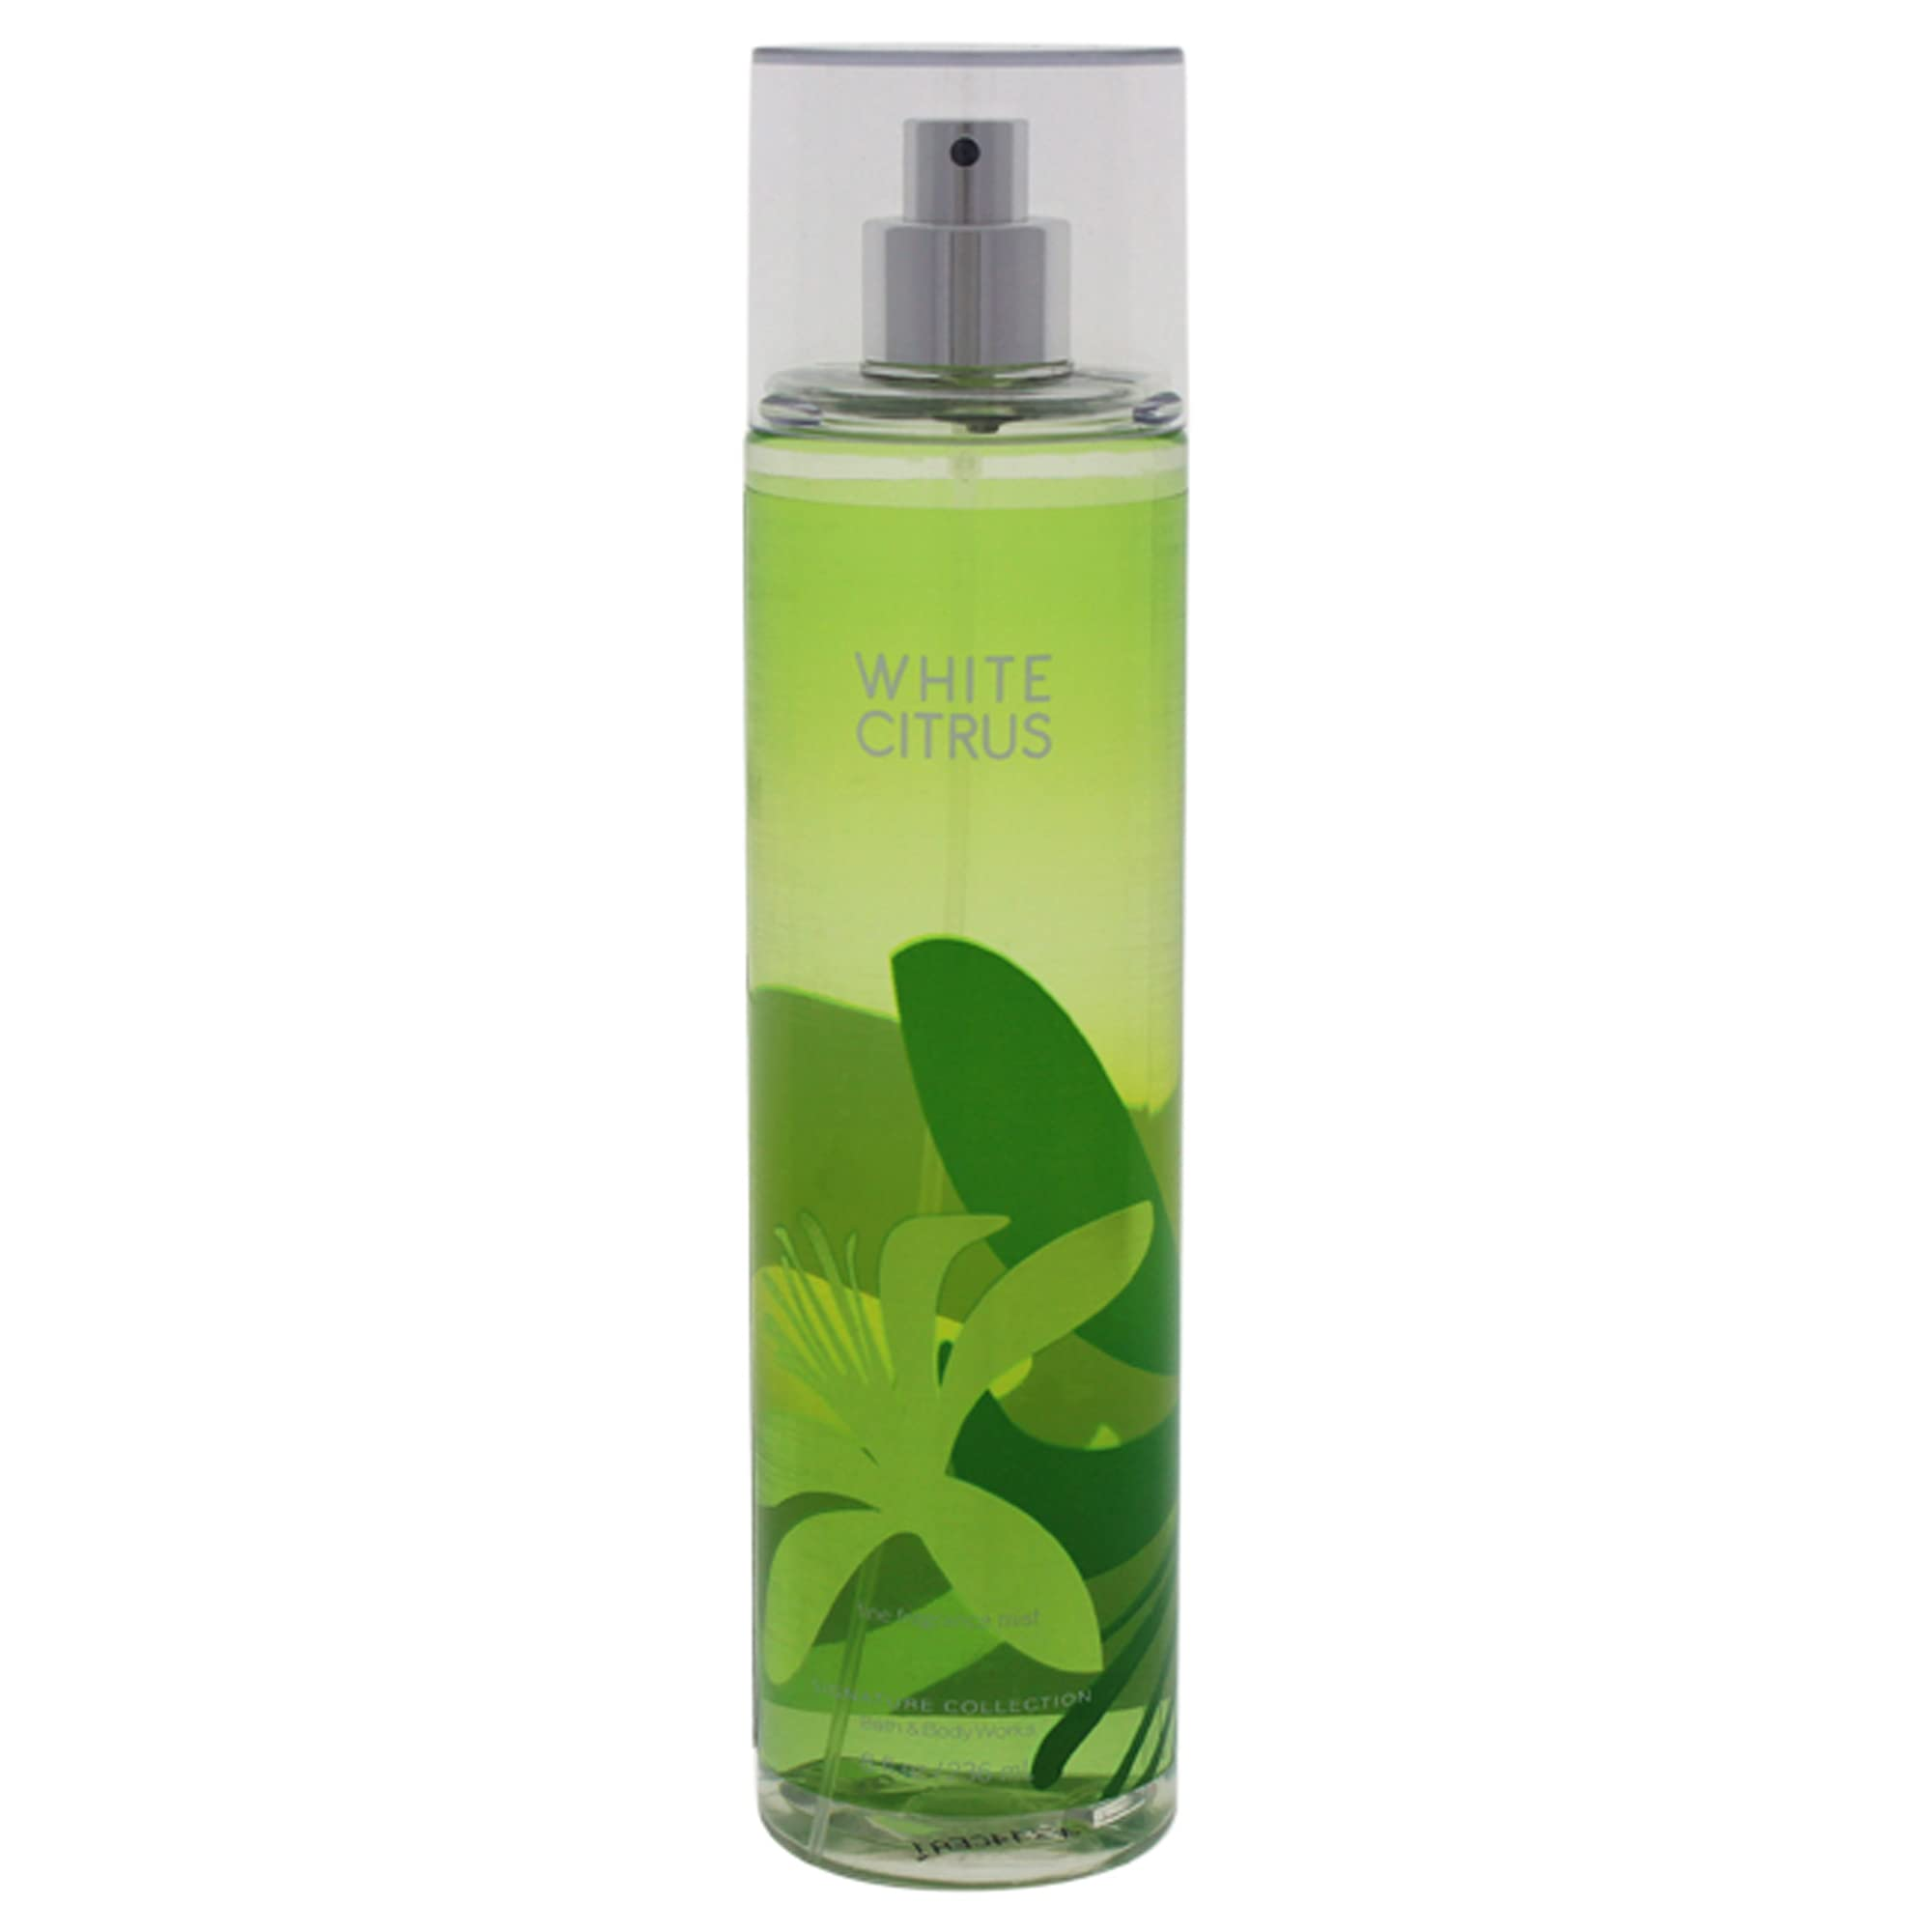 Bath & Body Works WHITE CITRUS Fine Fragrance Mist 8 oz / 236 mL